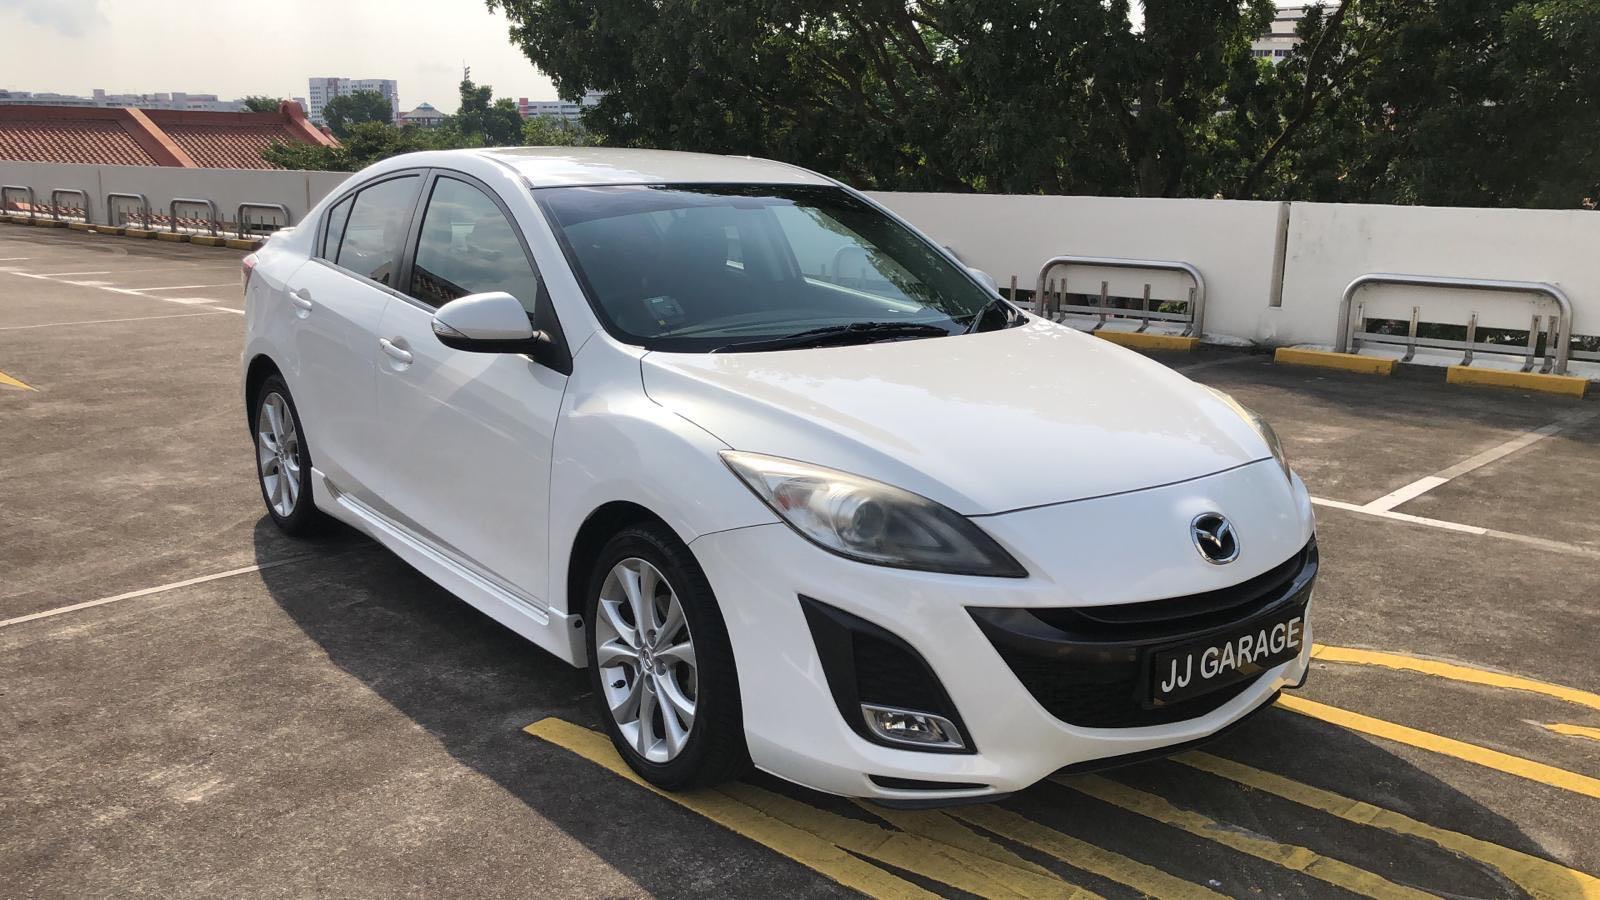 National Day / Hari Raya Haji Car Rental Promotions